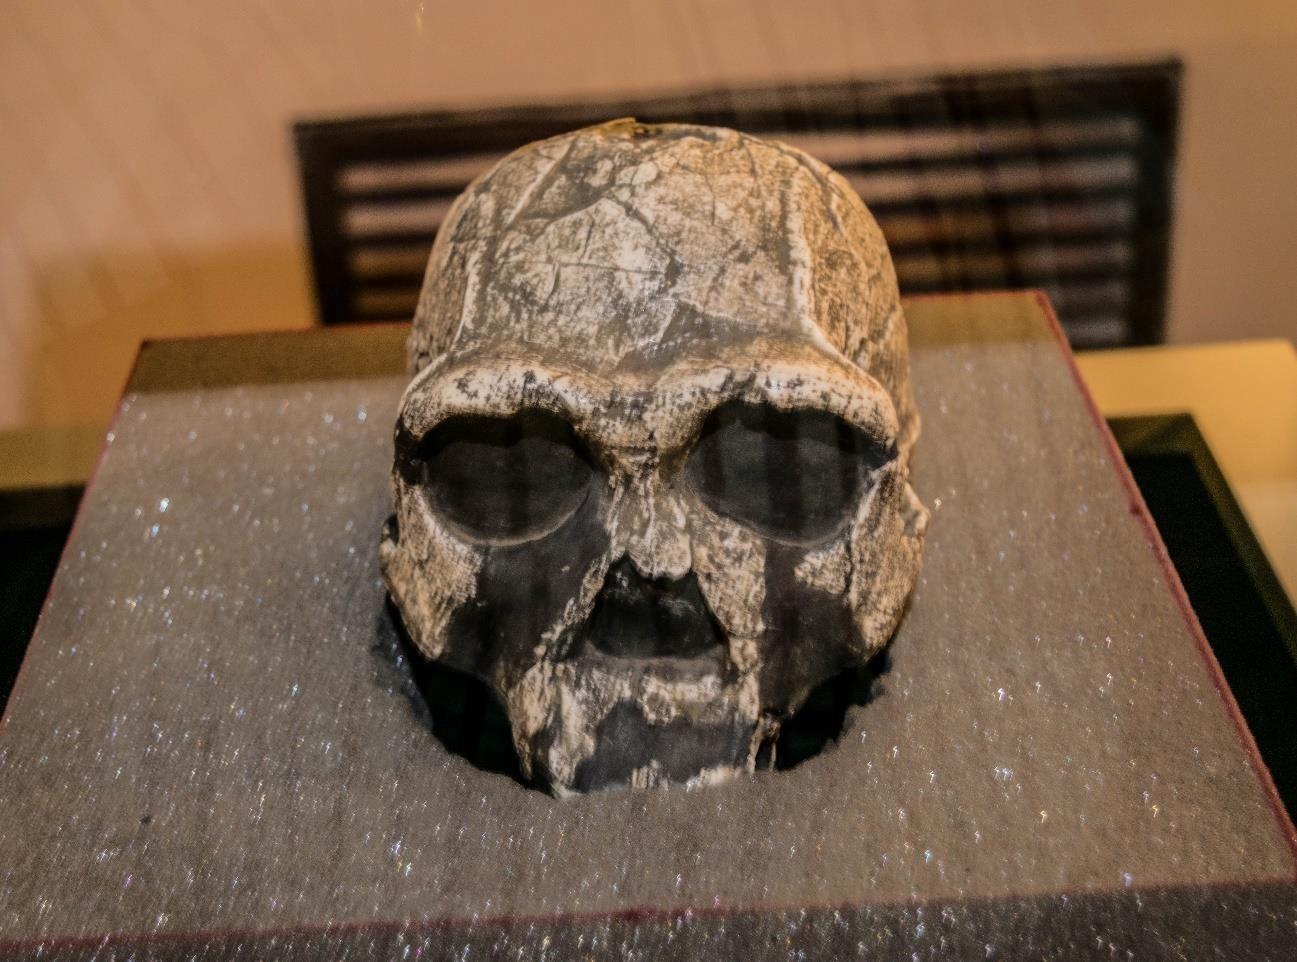 Figure 2: Homo Erectus skull on display in the Early Man gallery, National Museum of Kenya